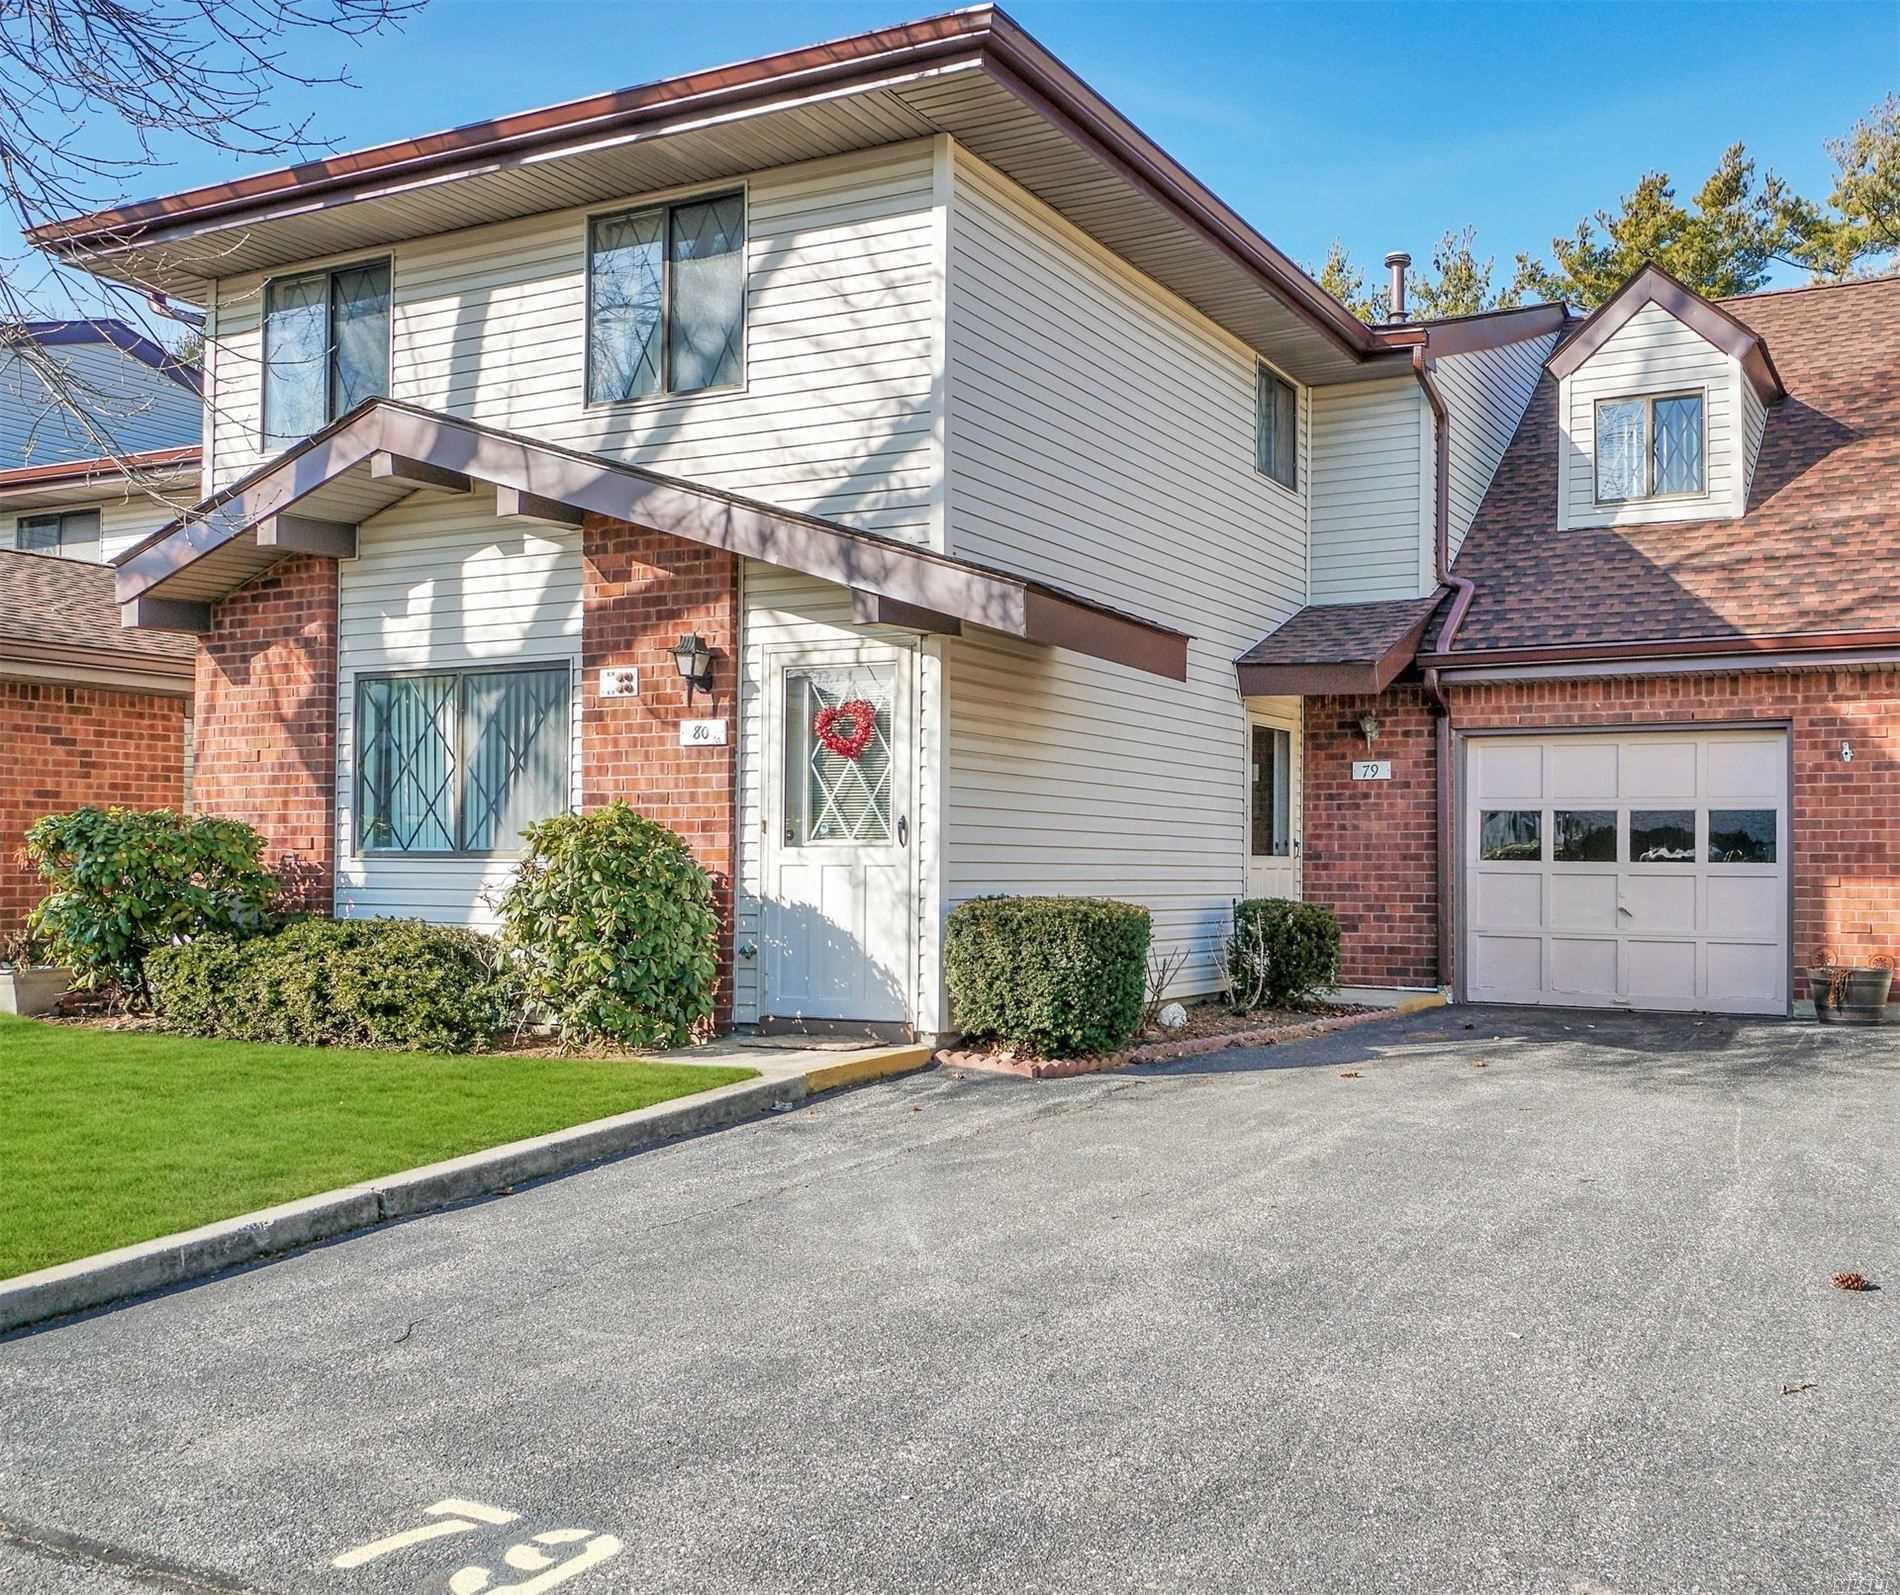 Property for sale at 79 Cambridge Drive # 79, Copiague NY 11726, Copiague,  New York 11726